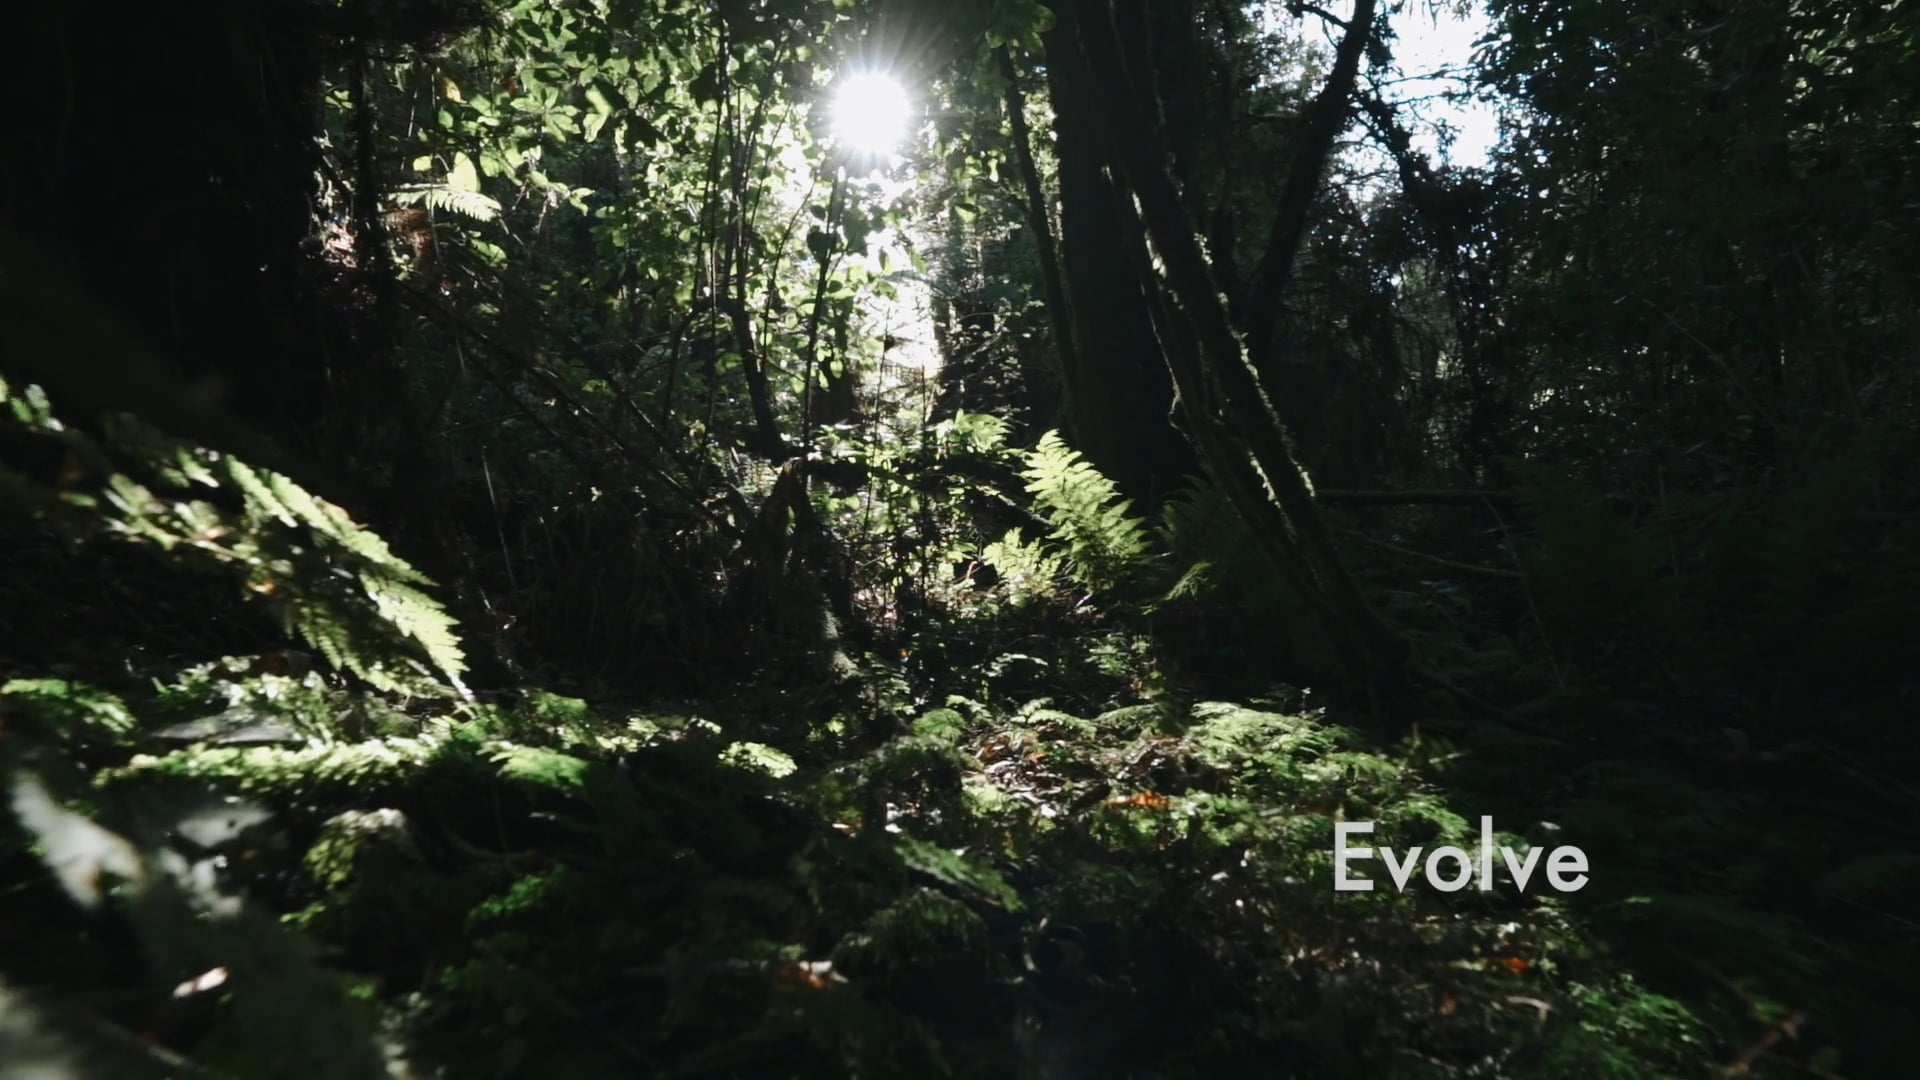 Ep 2: Evolve